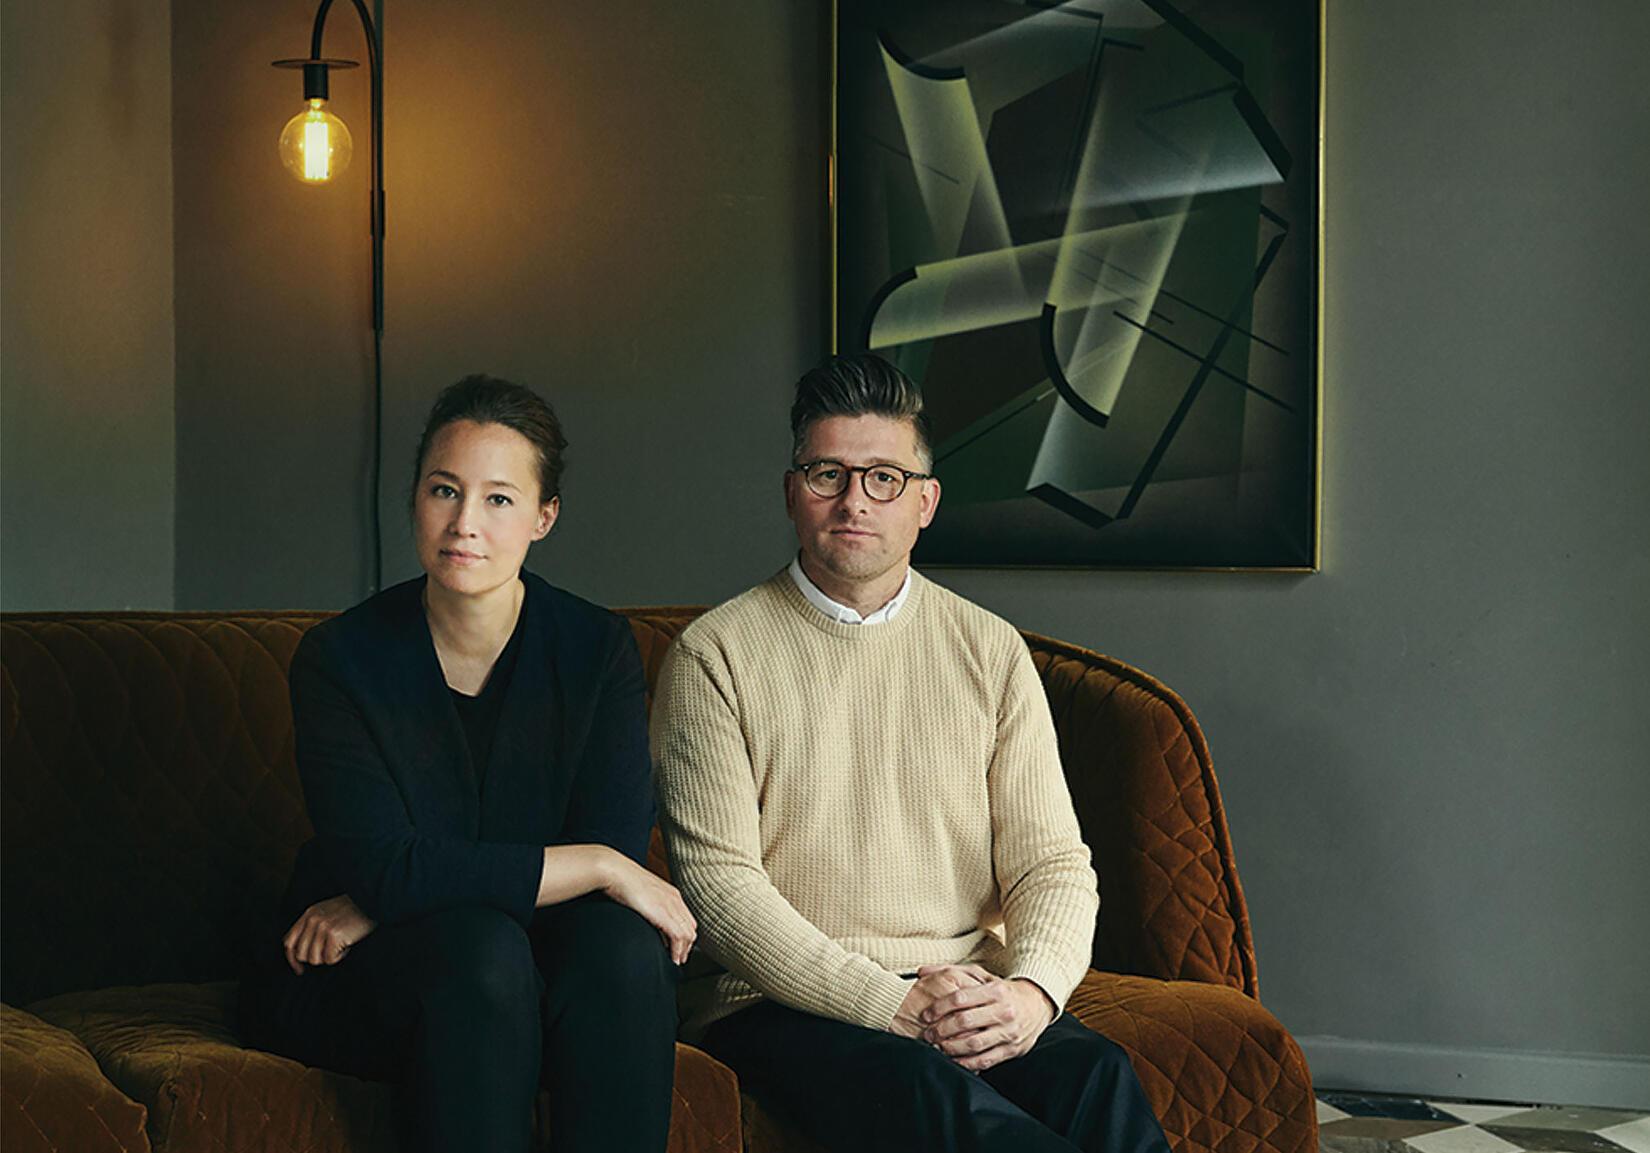 Grundarna Rasmus och Ida Linea Hildebrand bakom Friends & Founders